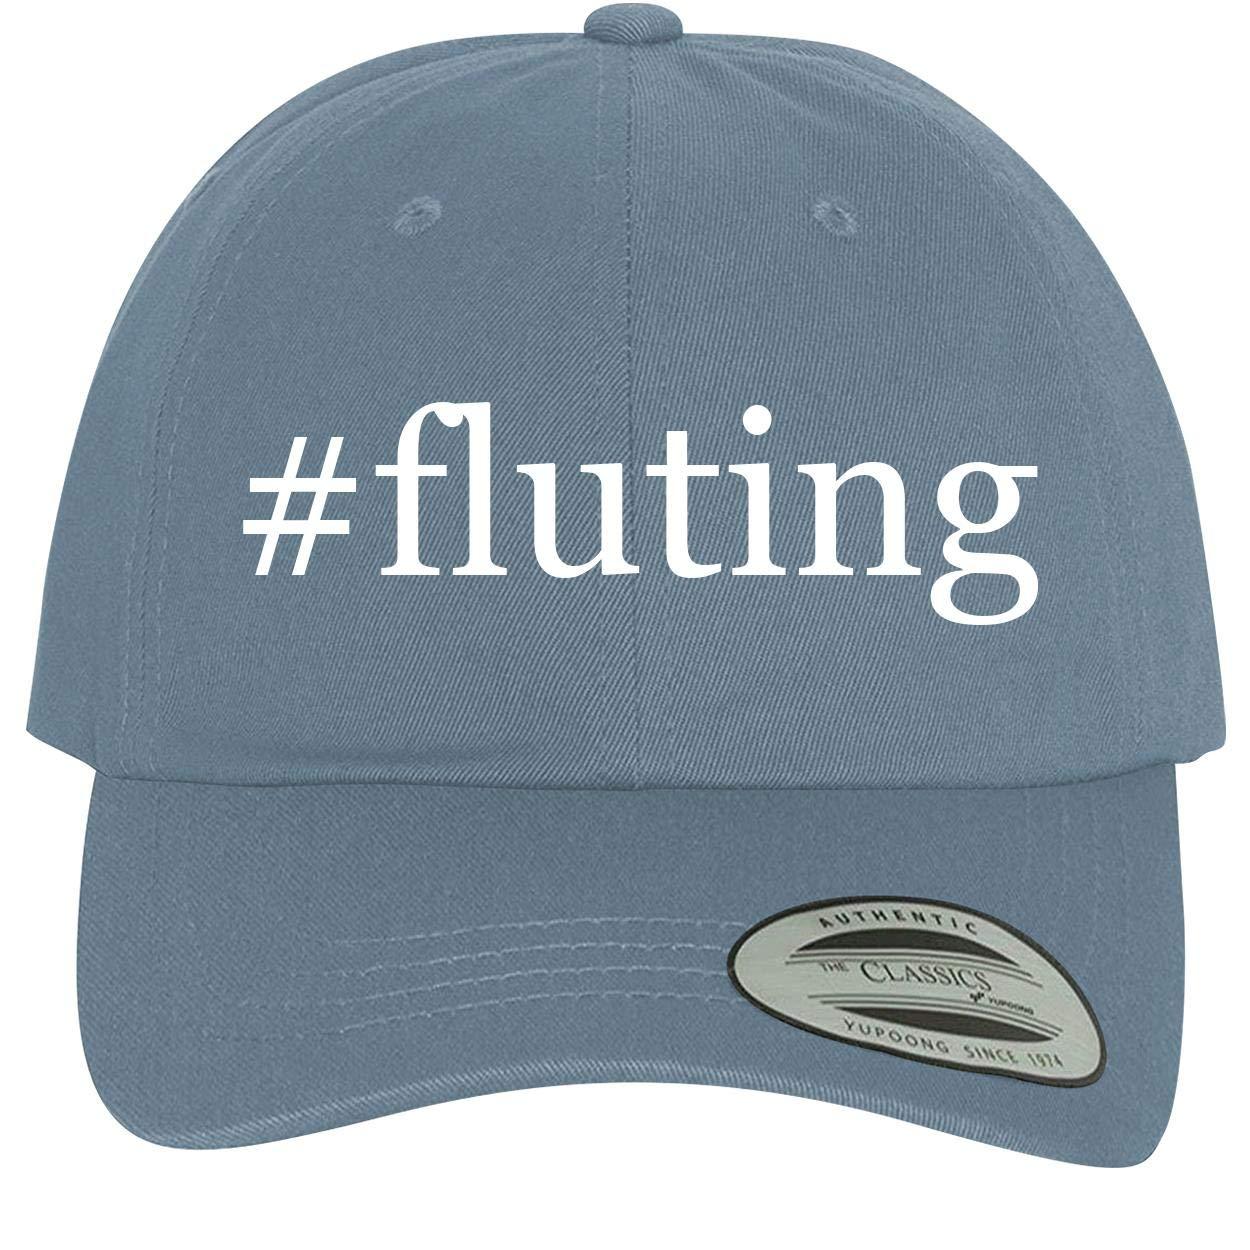 BH Cool Designs #Fluting Comfortable Dad Hat Baseball Cap